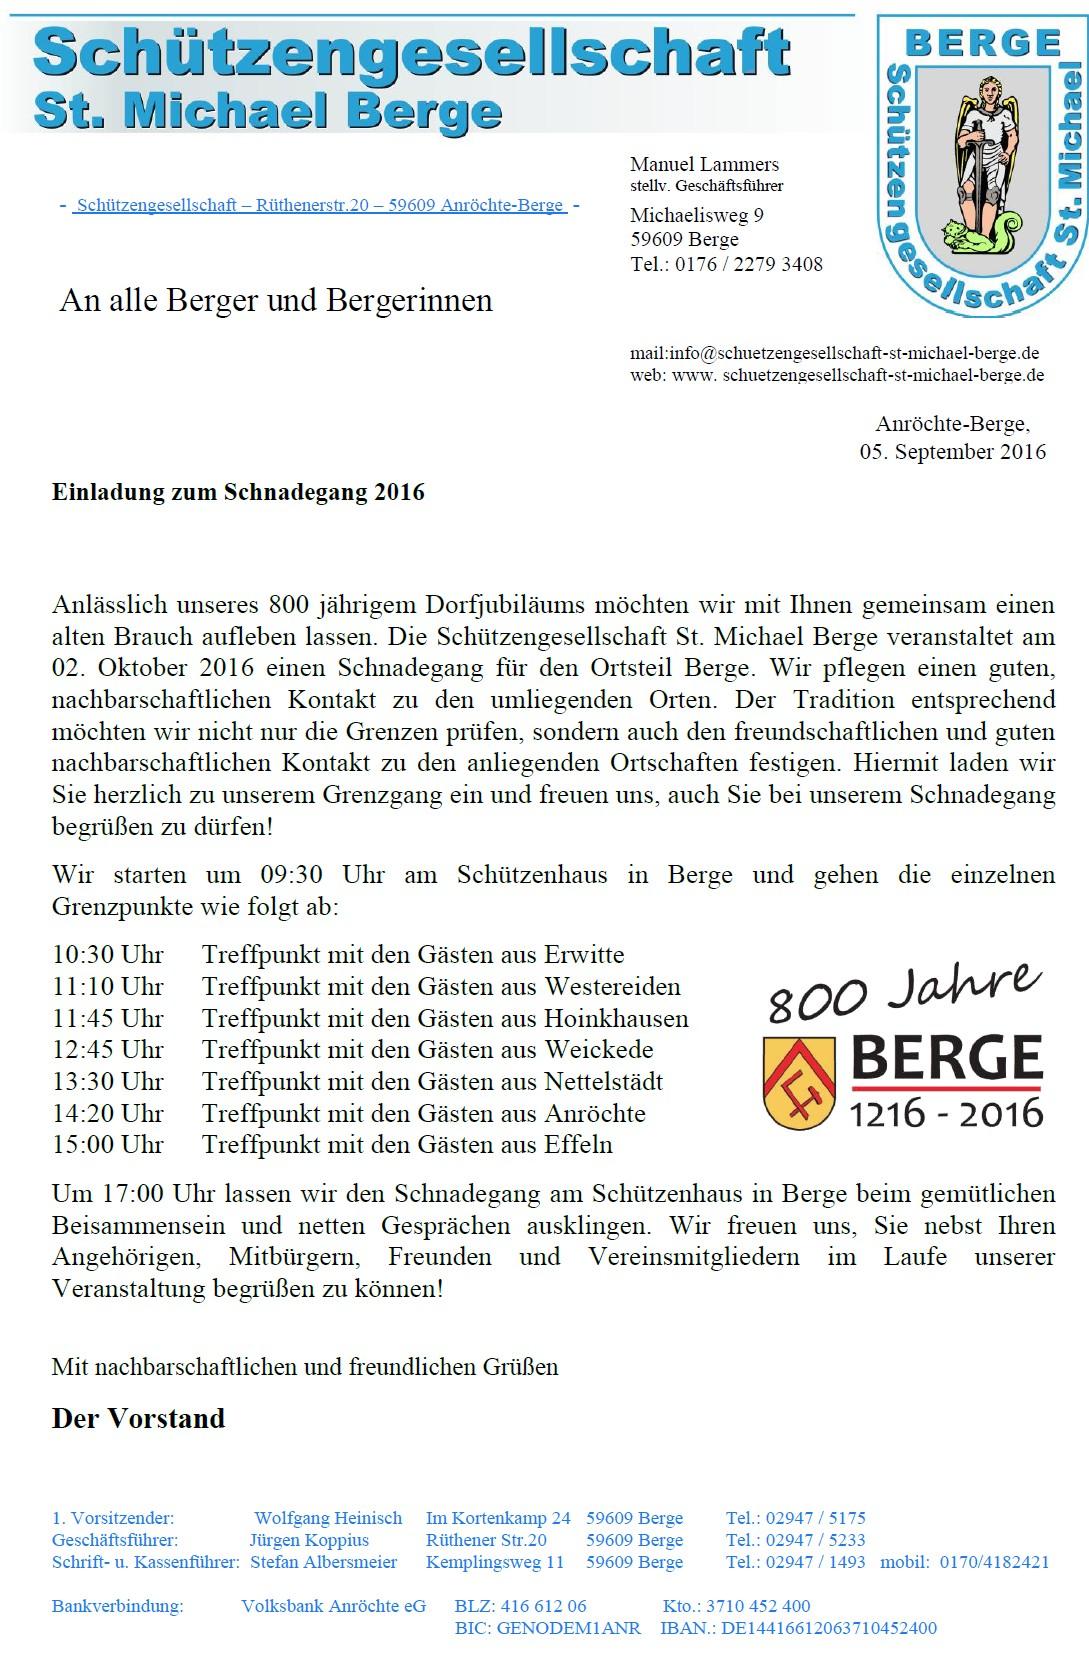 SchnadegangEinladung-02-10-2016.jpg - 491.74 kB